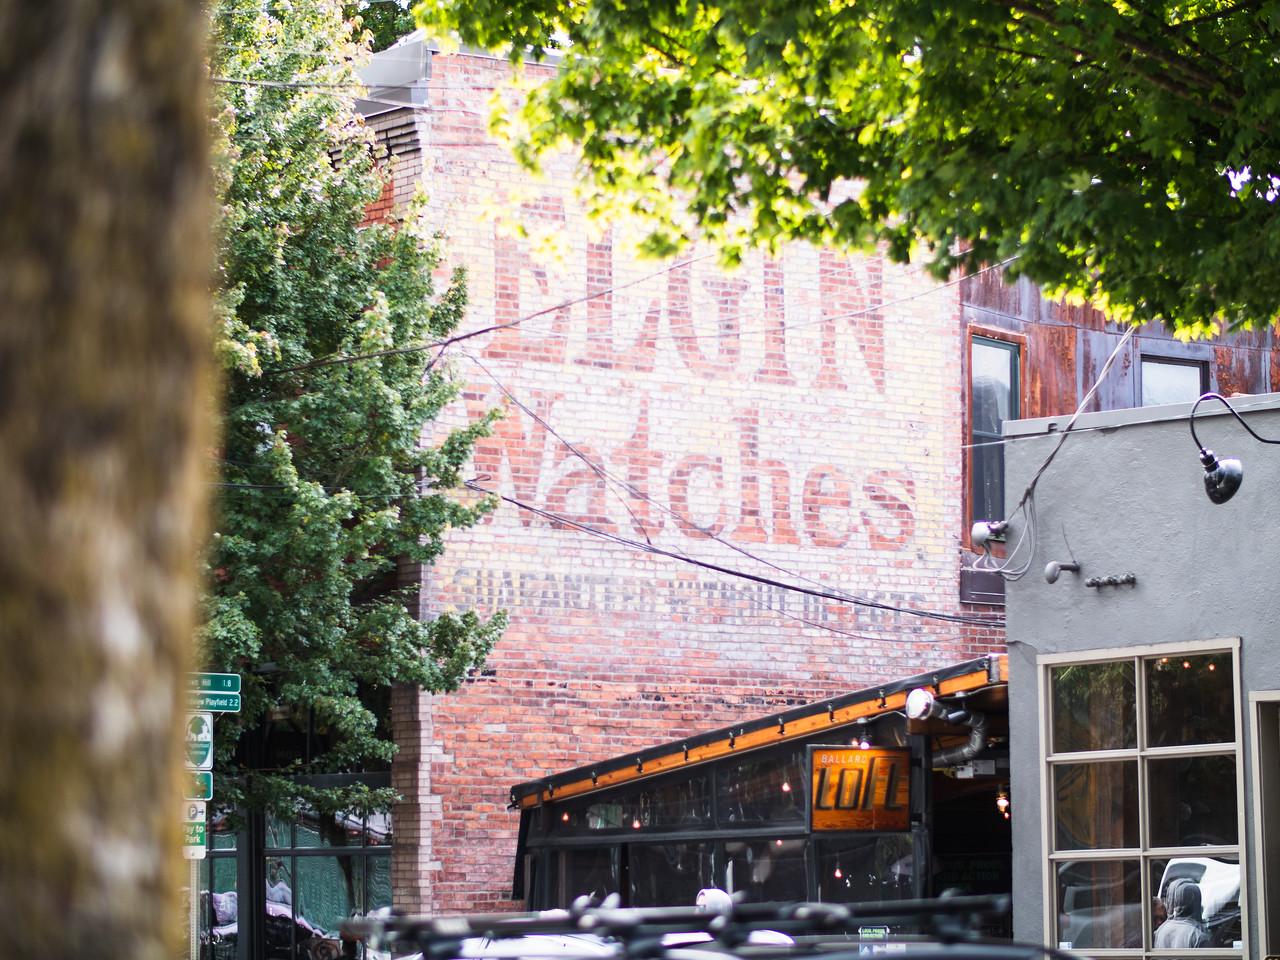 Old Ballard   Seattle, Wa   October 2017